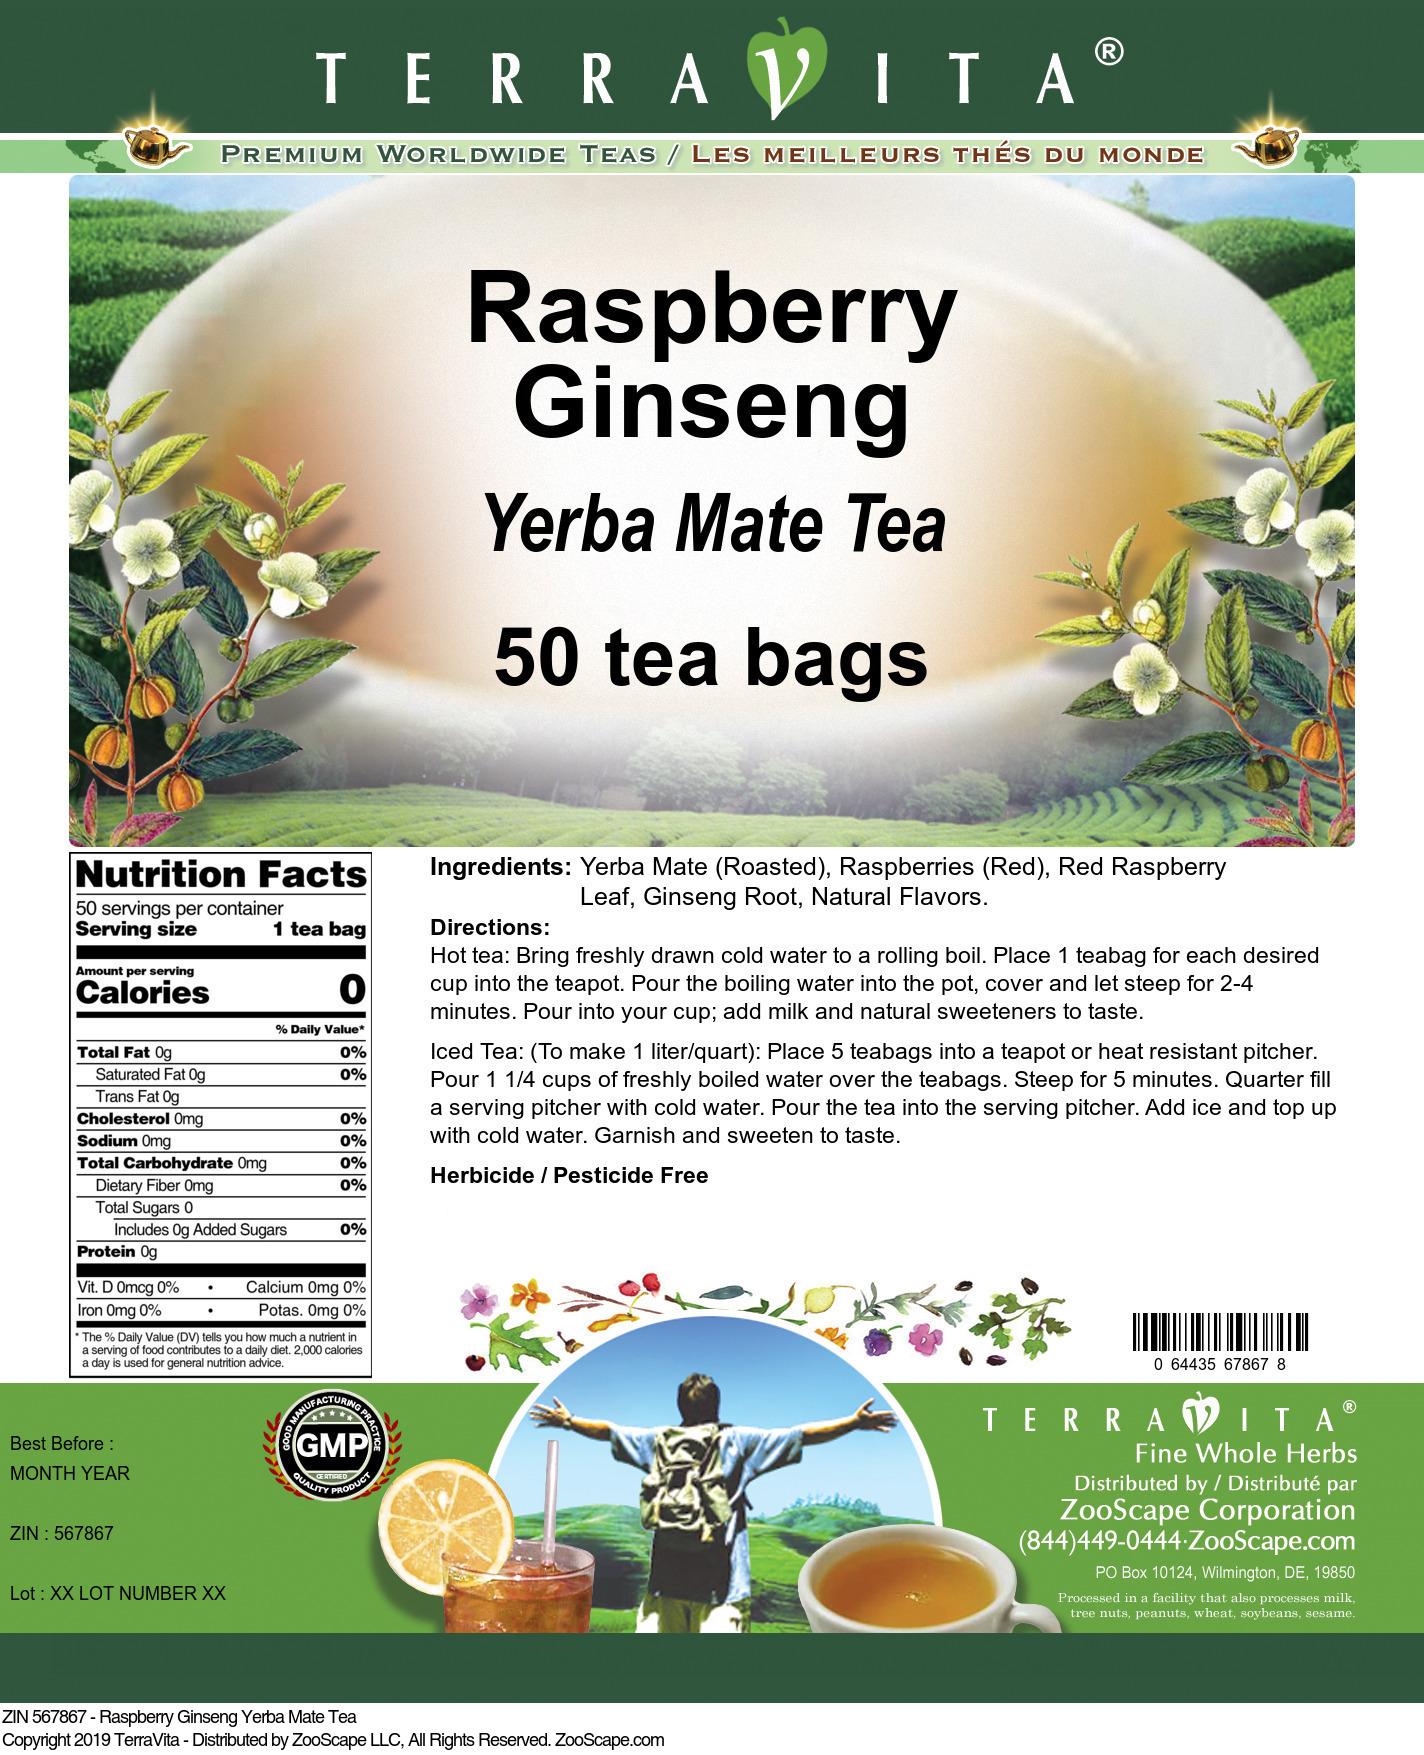 Raspberry Ginseng Yerba Mate